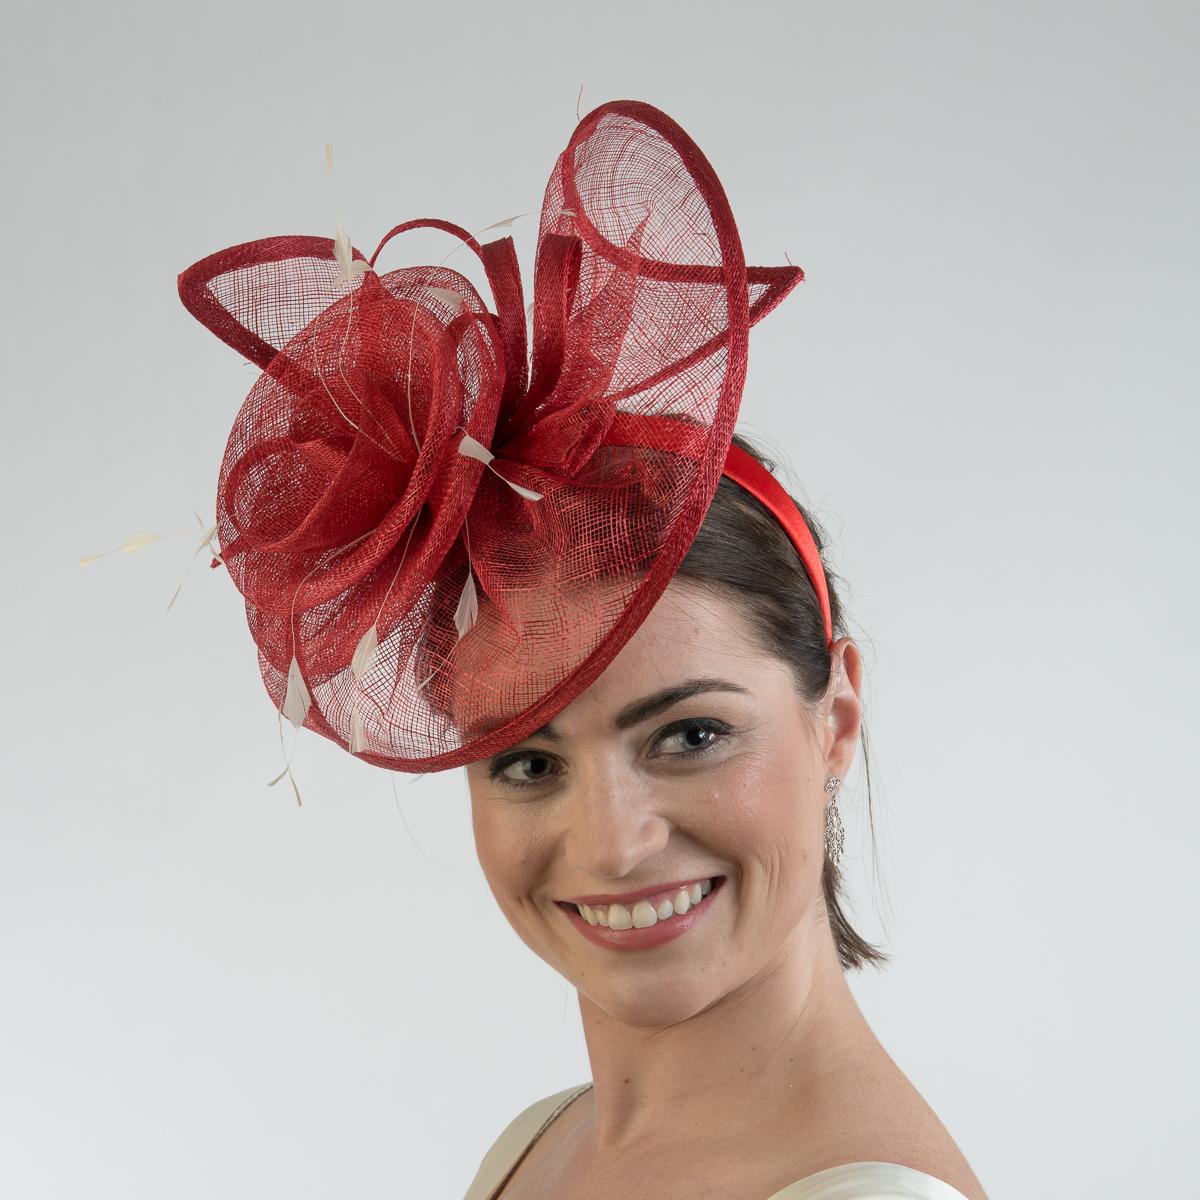 b0eeebfb036 Dark Red - White Flower Trimed Sinamay Headband Fascinator Cocktail ...